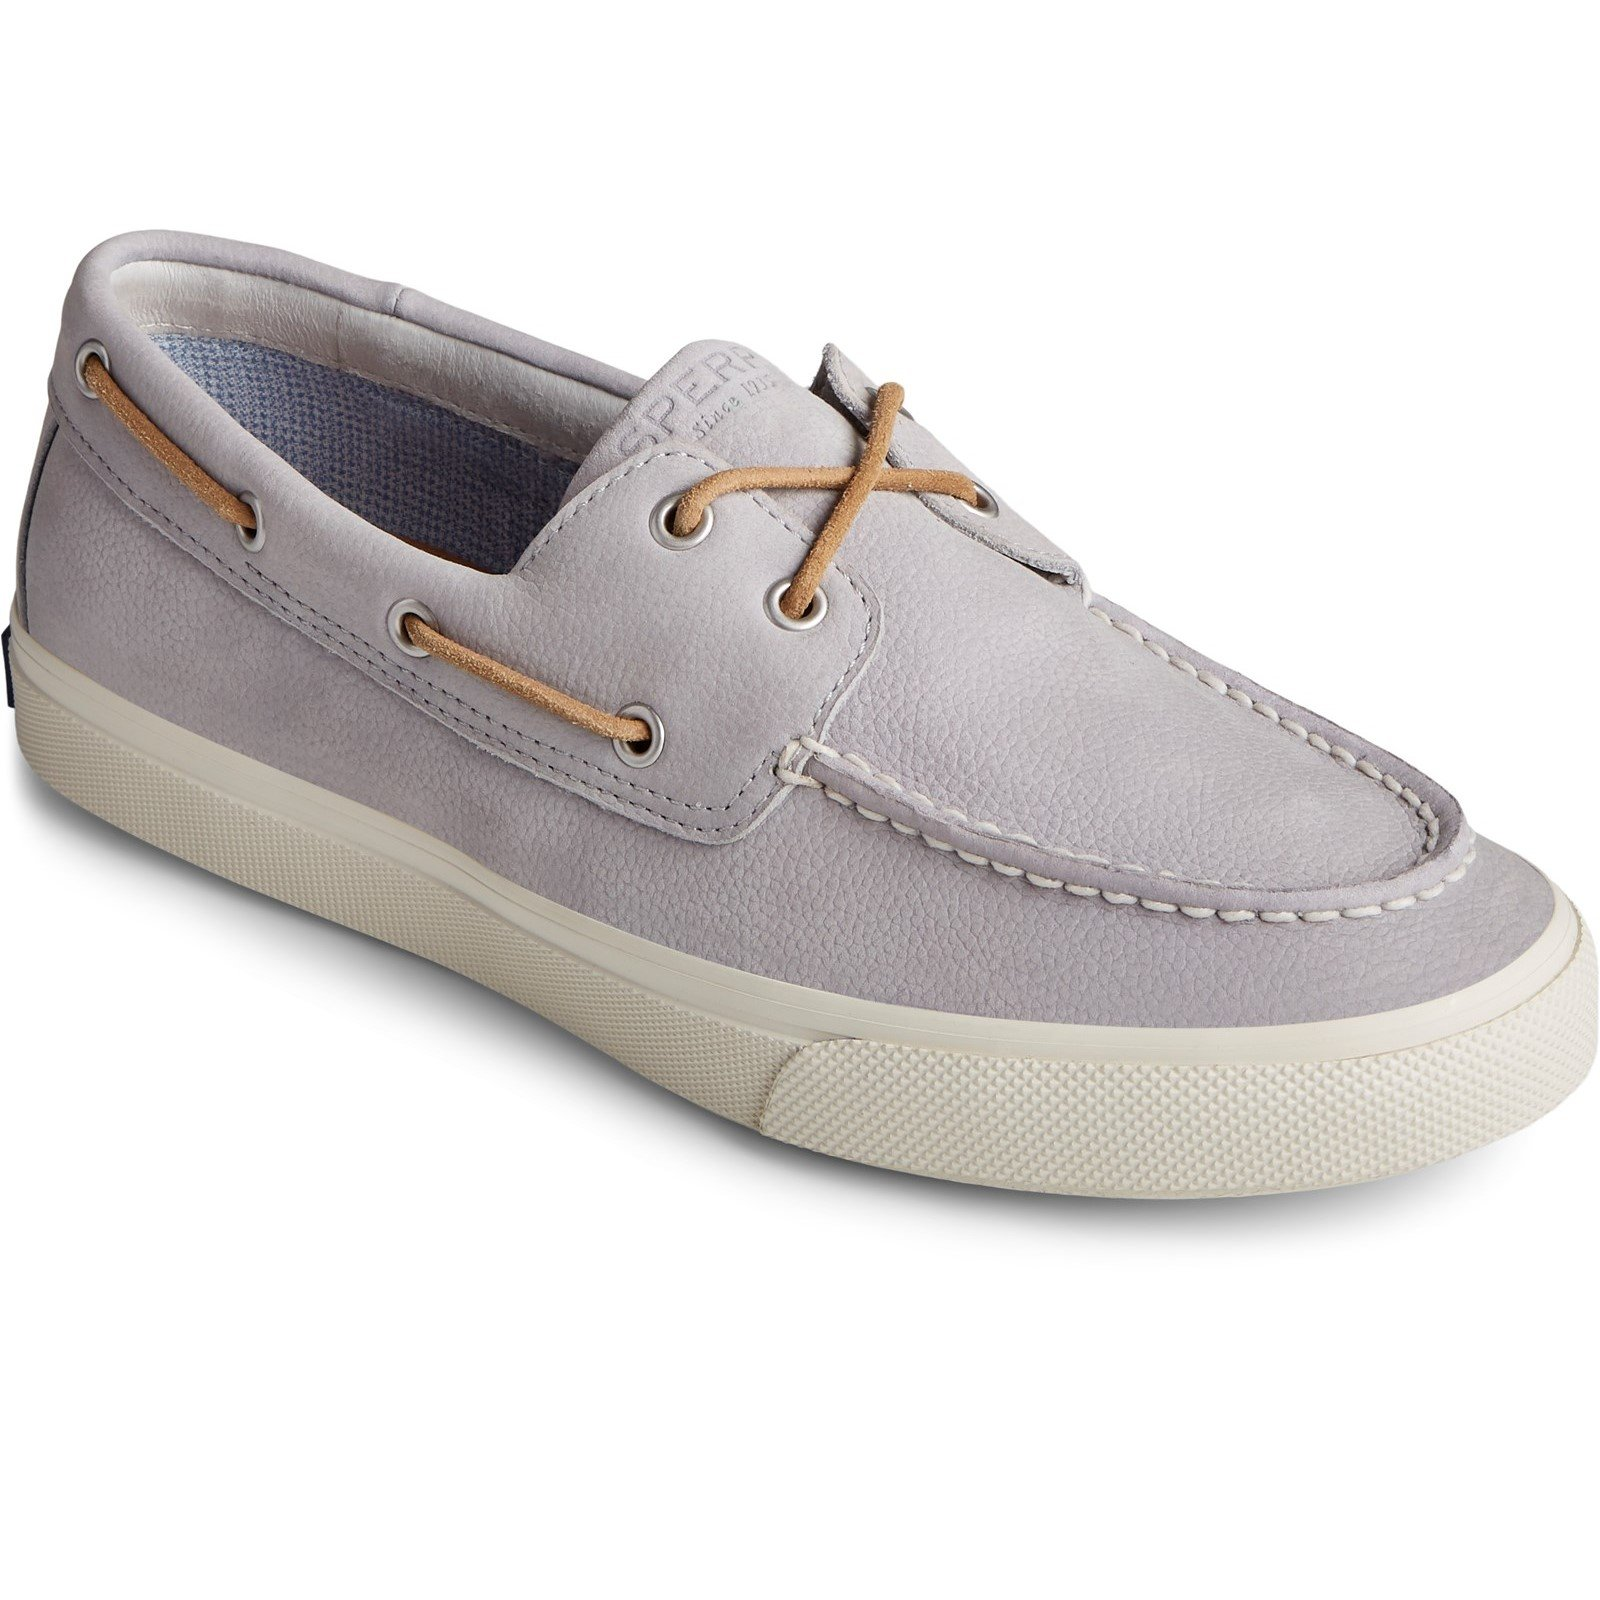 Sperry Men's Bahama Plushwave Boat Shoe Grey 32925 - Grey 10